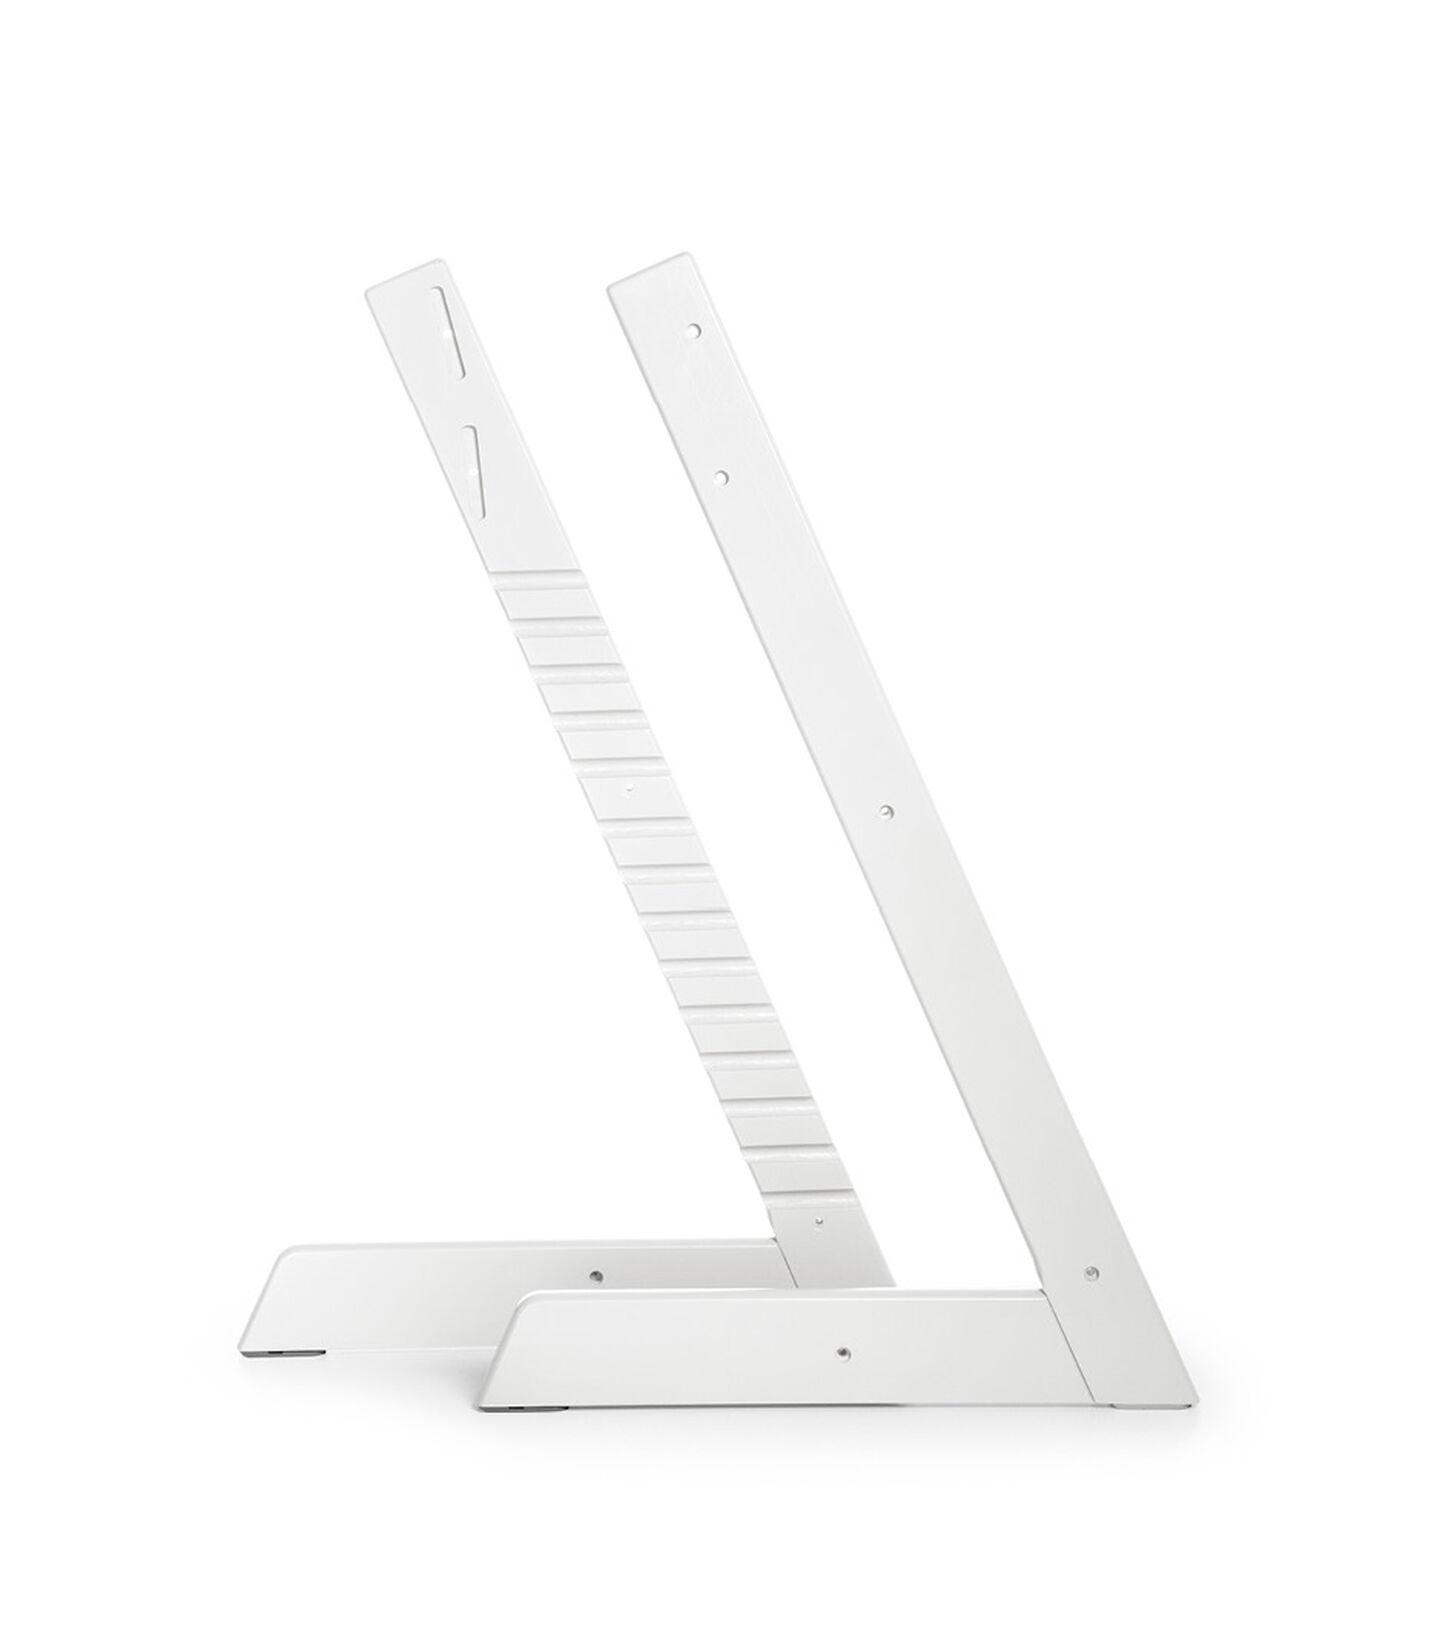 Tripp Trapp® Stuhlbeine set White, White, mainview view 1